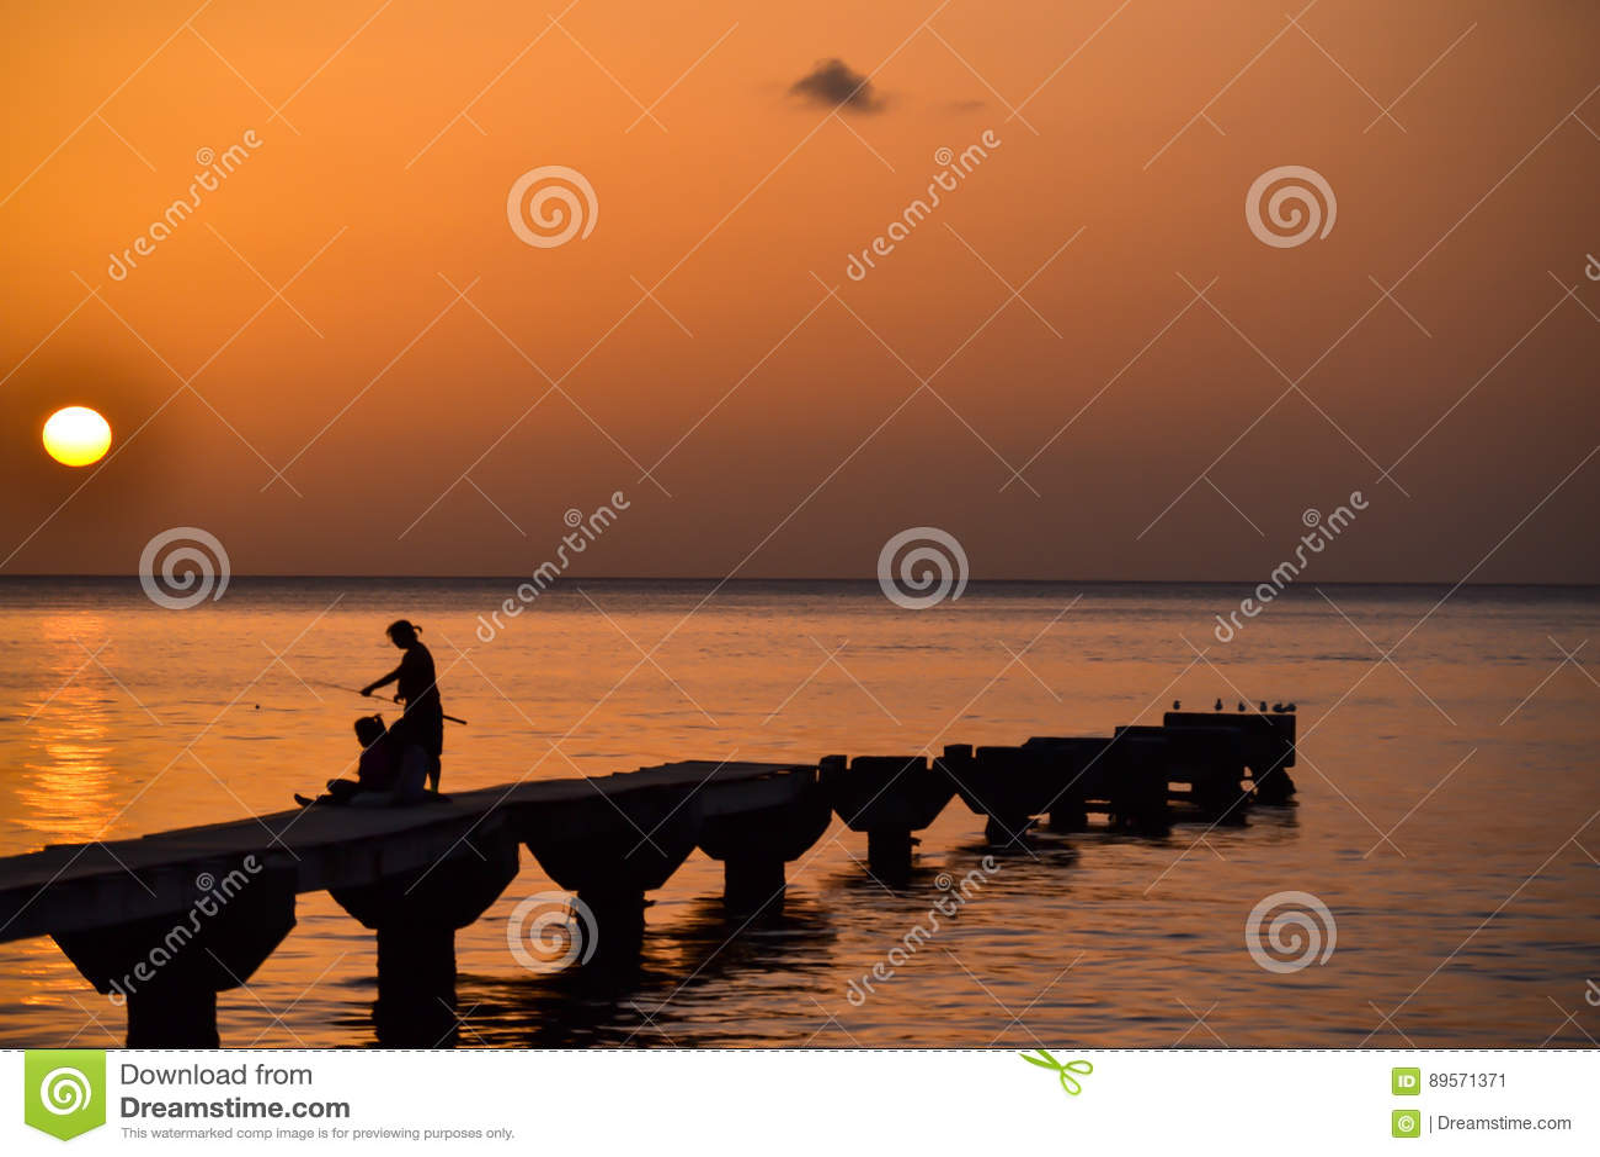 Dominica Island Sunset